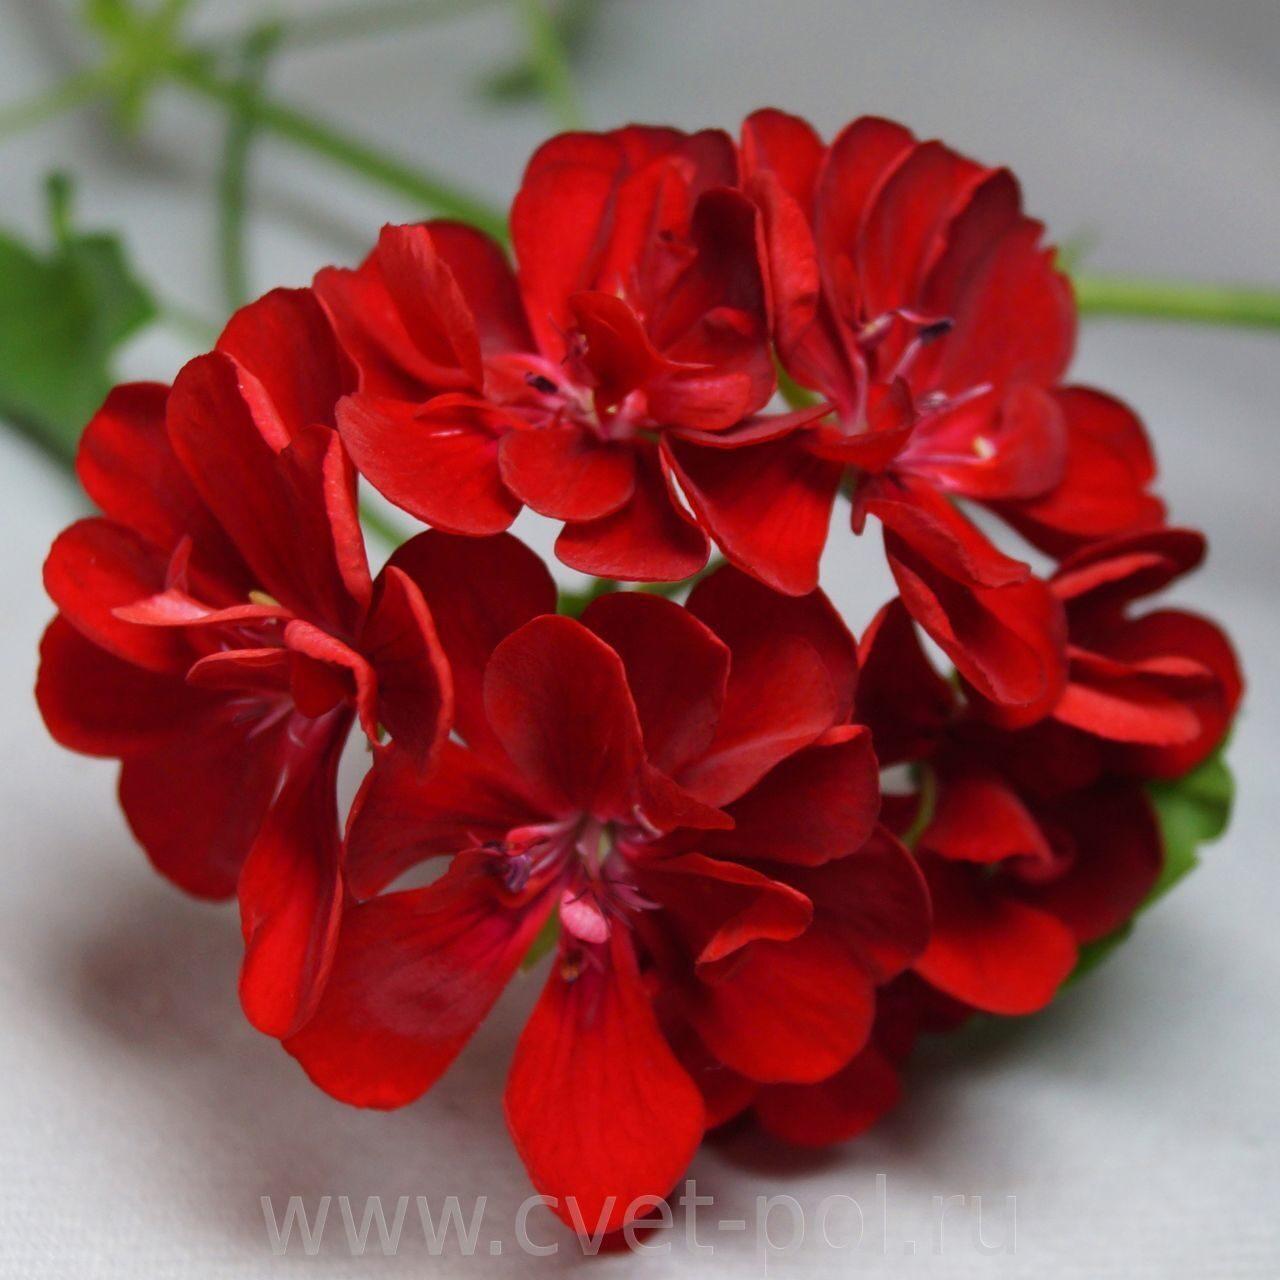 Пеларгония PAC Red Sybil